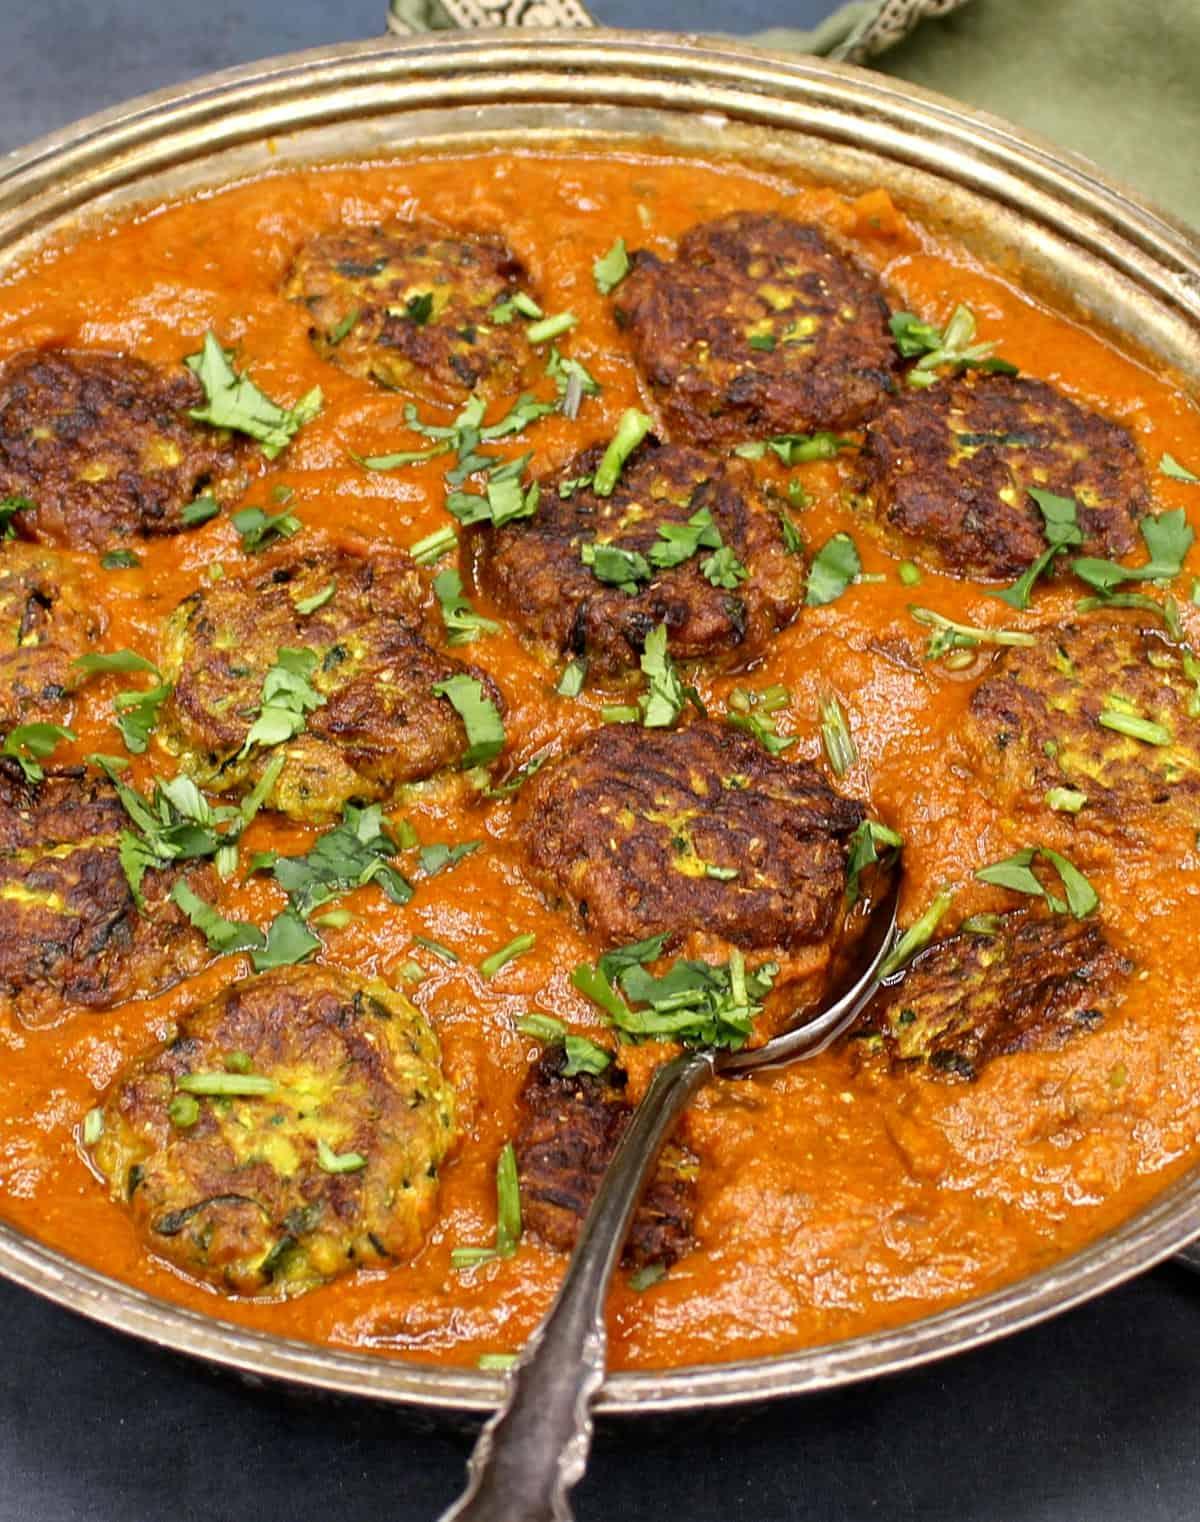 Close up of zucchini kofta curry with zucchini kofta ballls in an orange sauce garnished with cilantro.